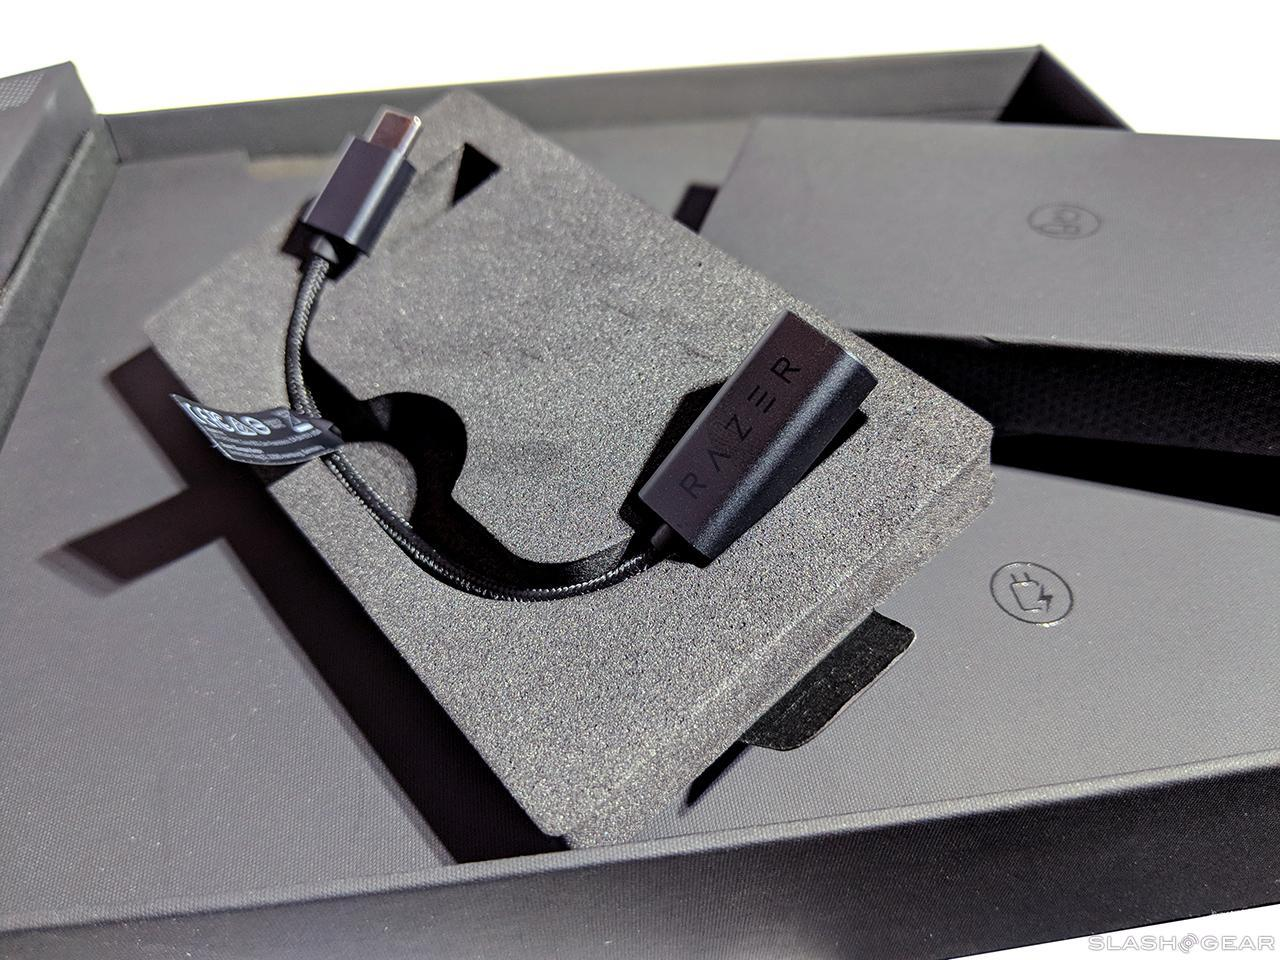 Razer Phone Review : Real Mobile Courage - SlashGear